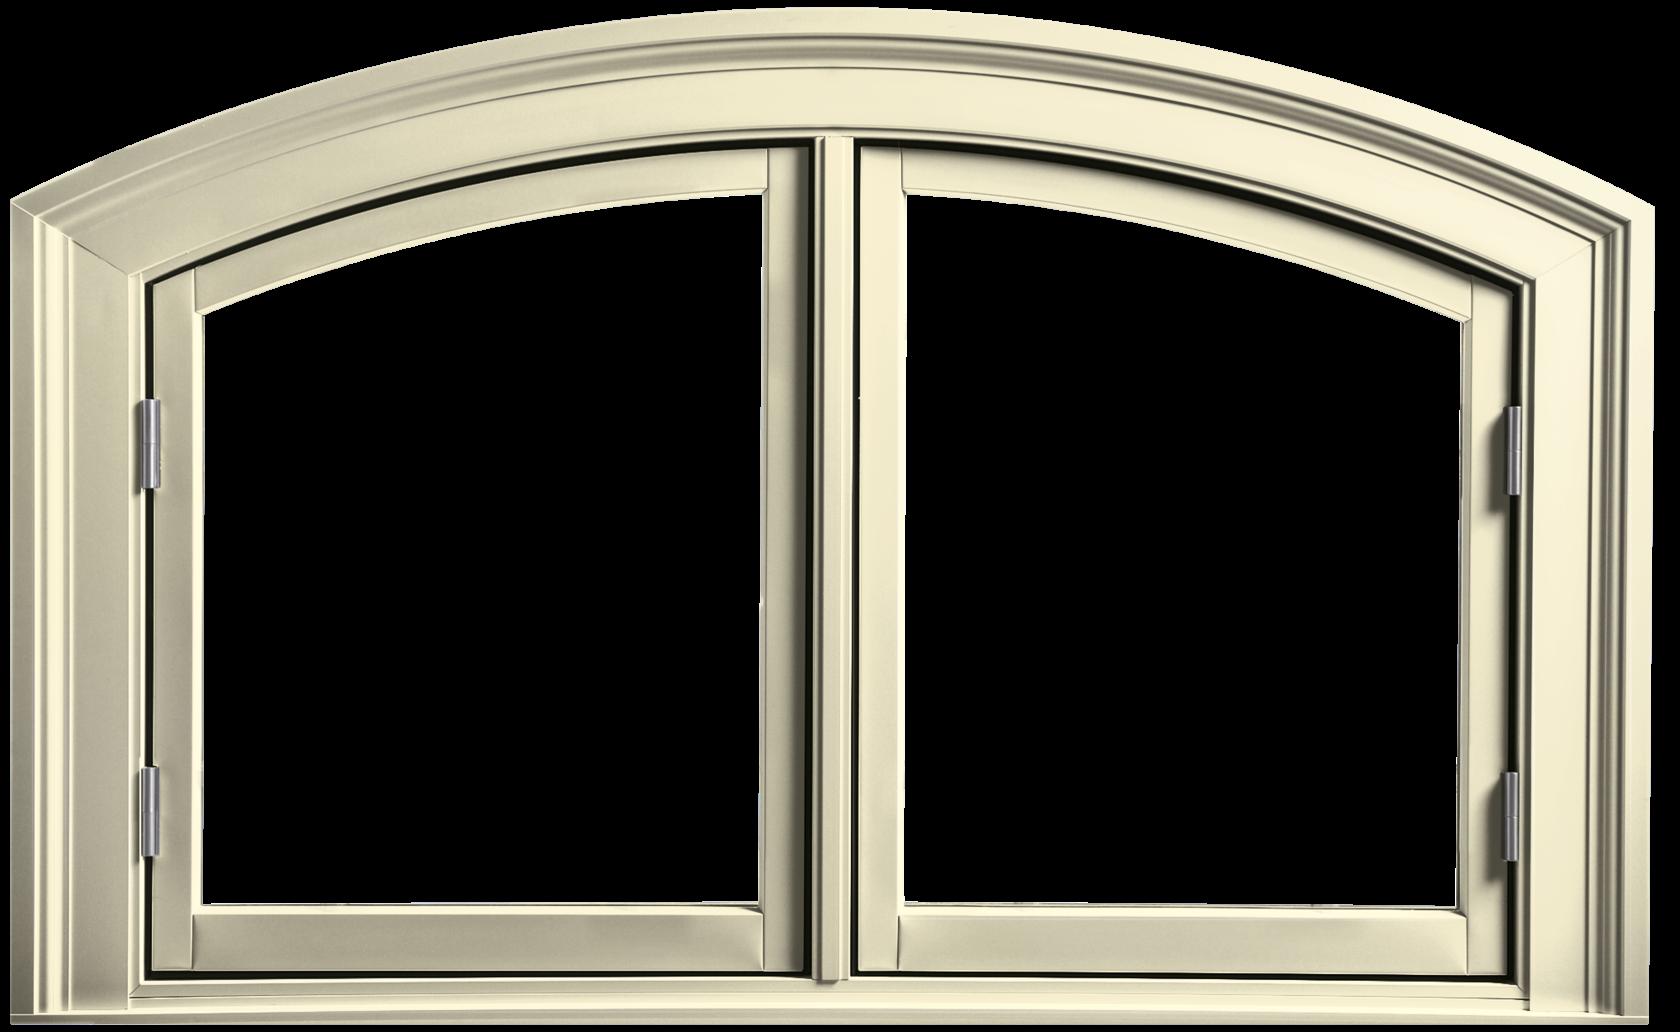 French casement windows - French Casement Windows 37